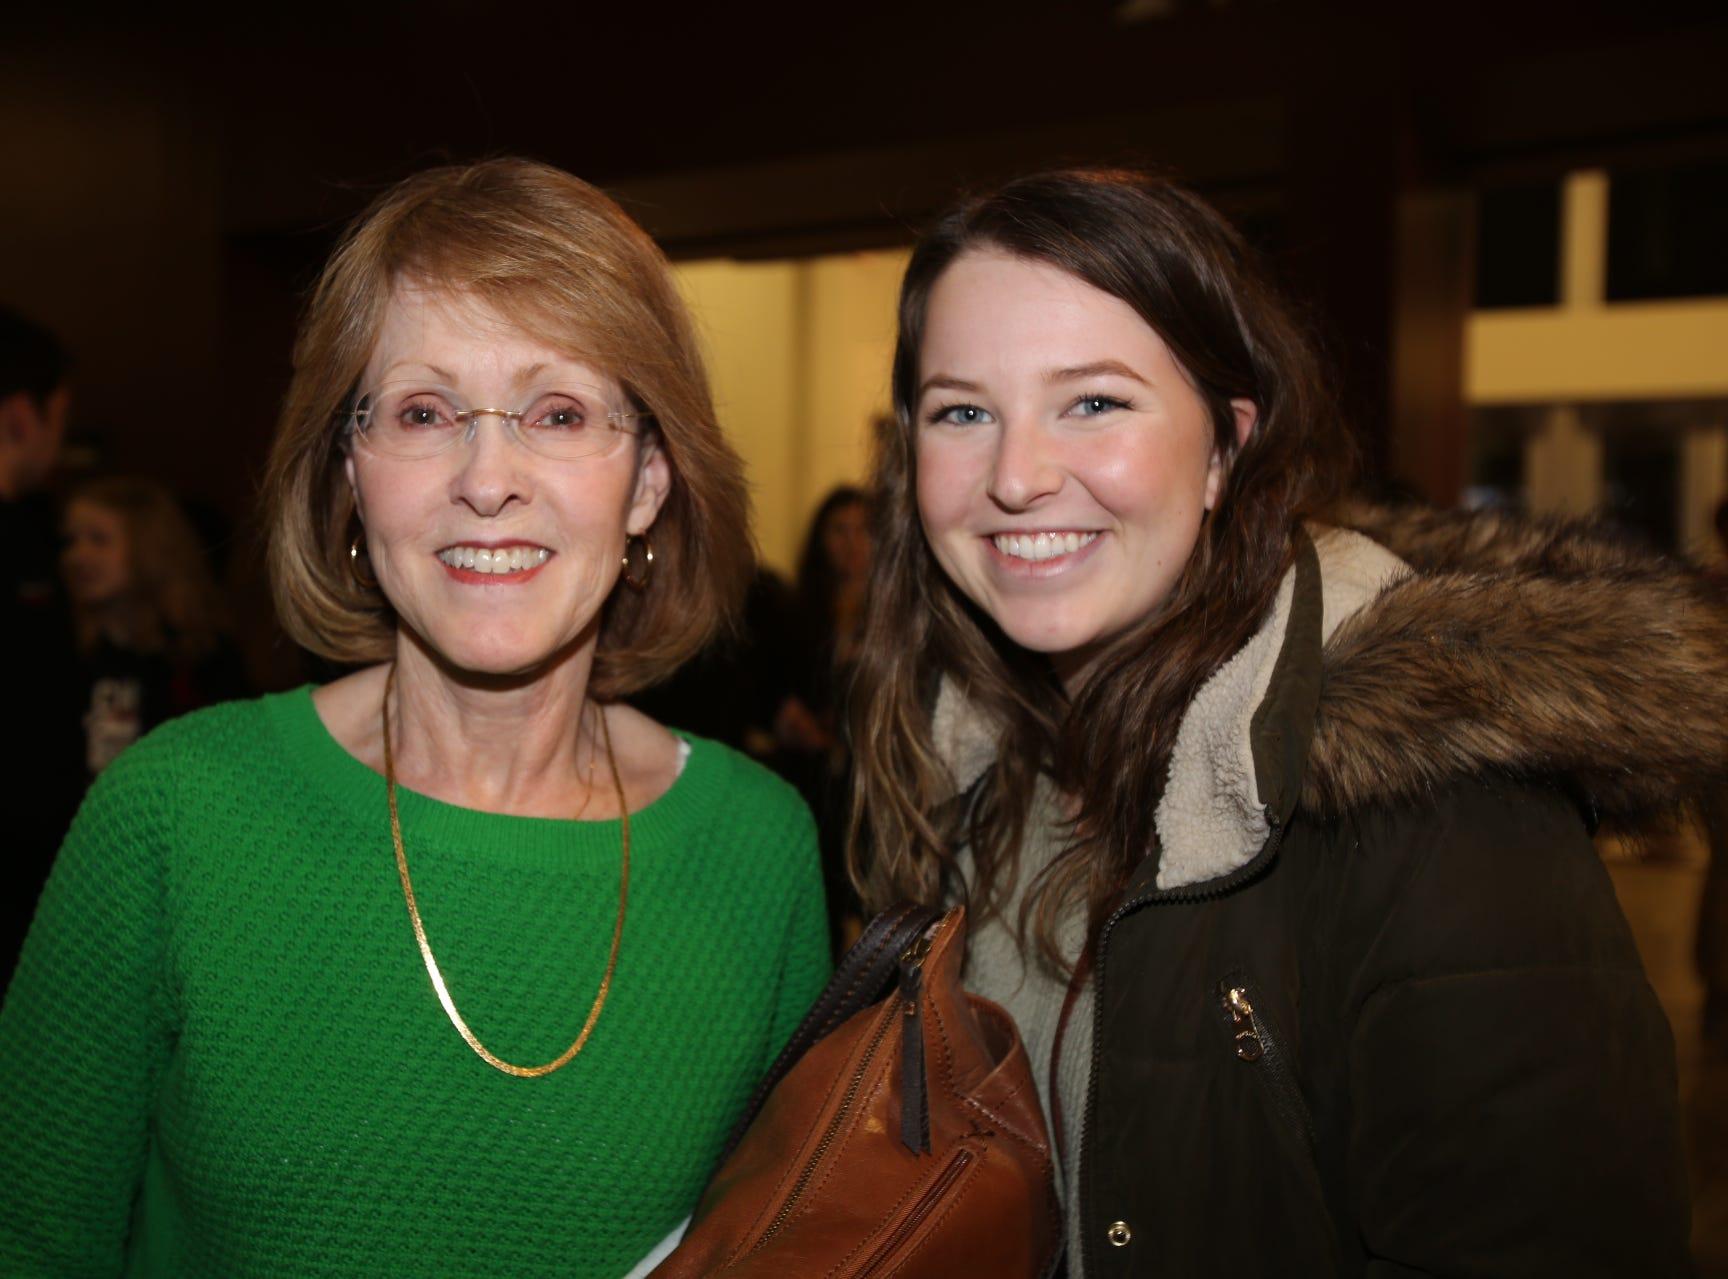 Janet Adams and Anna Rader